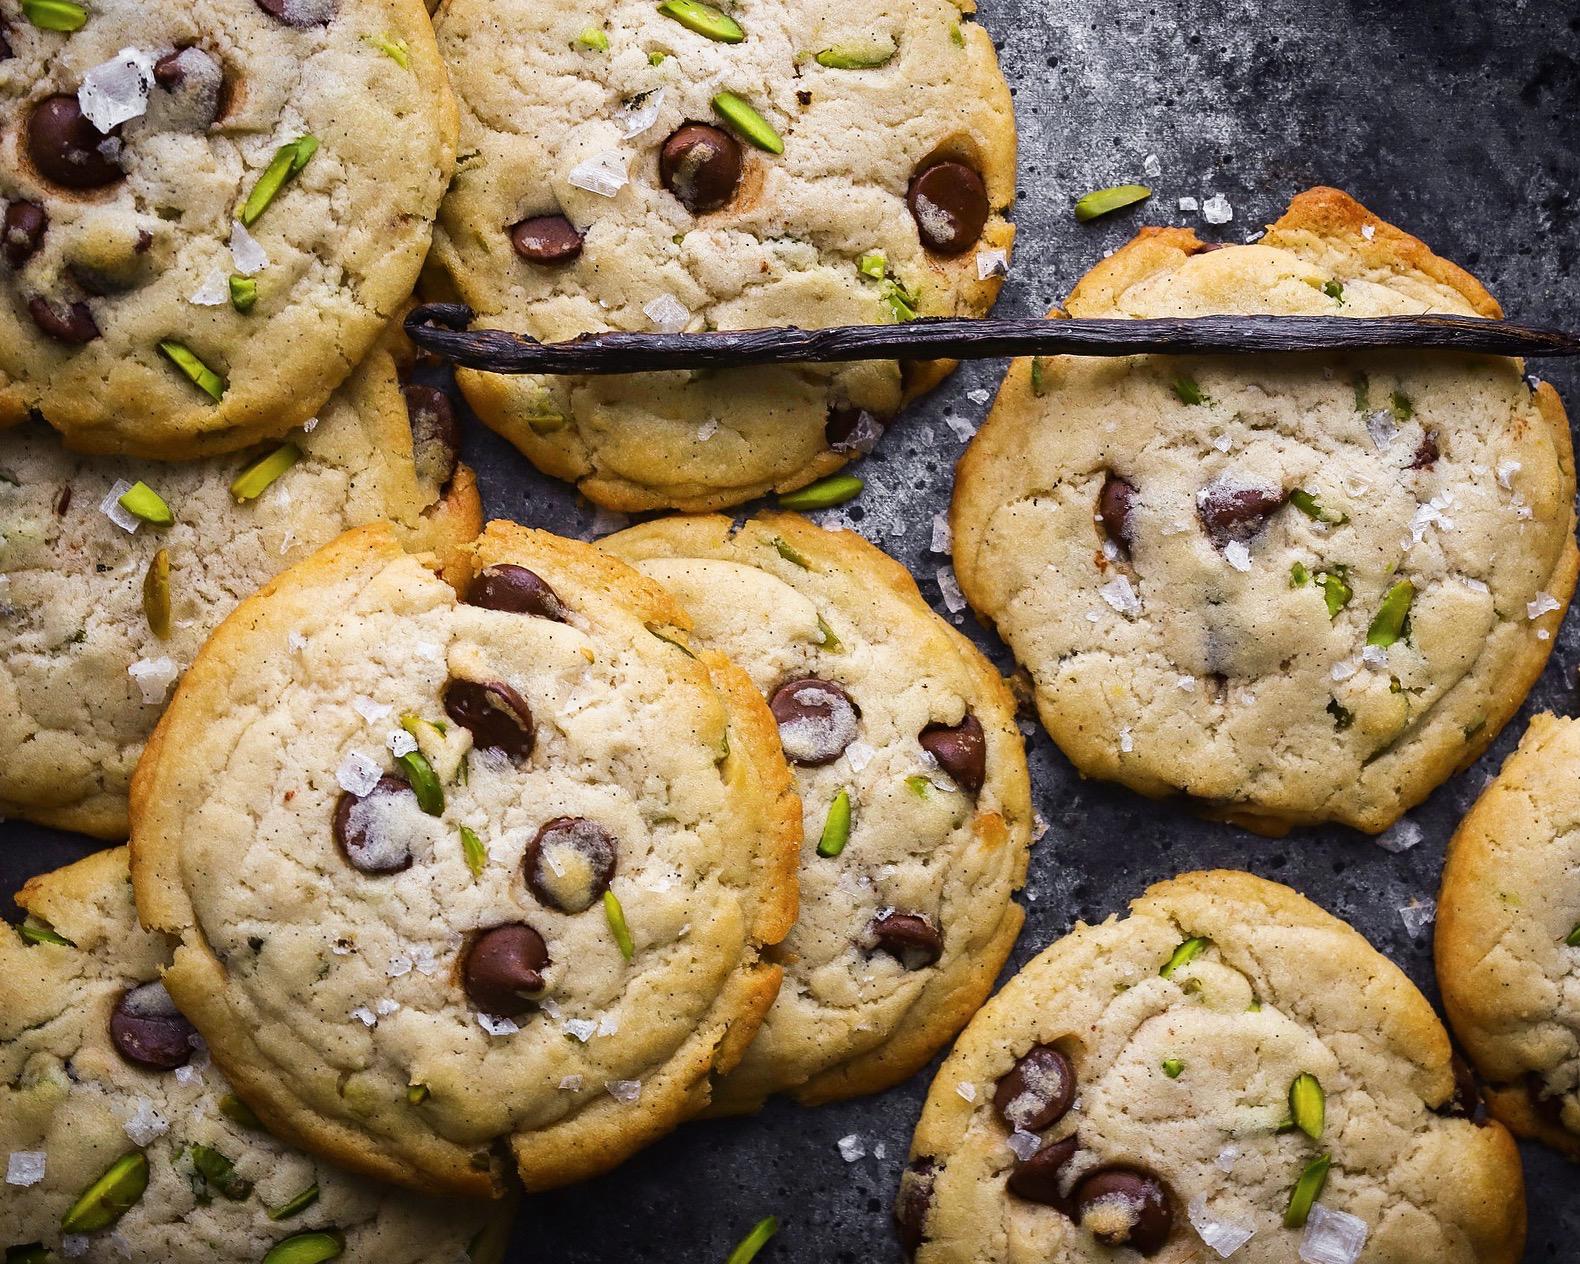 Vegan Pistachio & Vanilla Salt Chocolate Chip Cookies